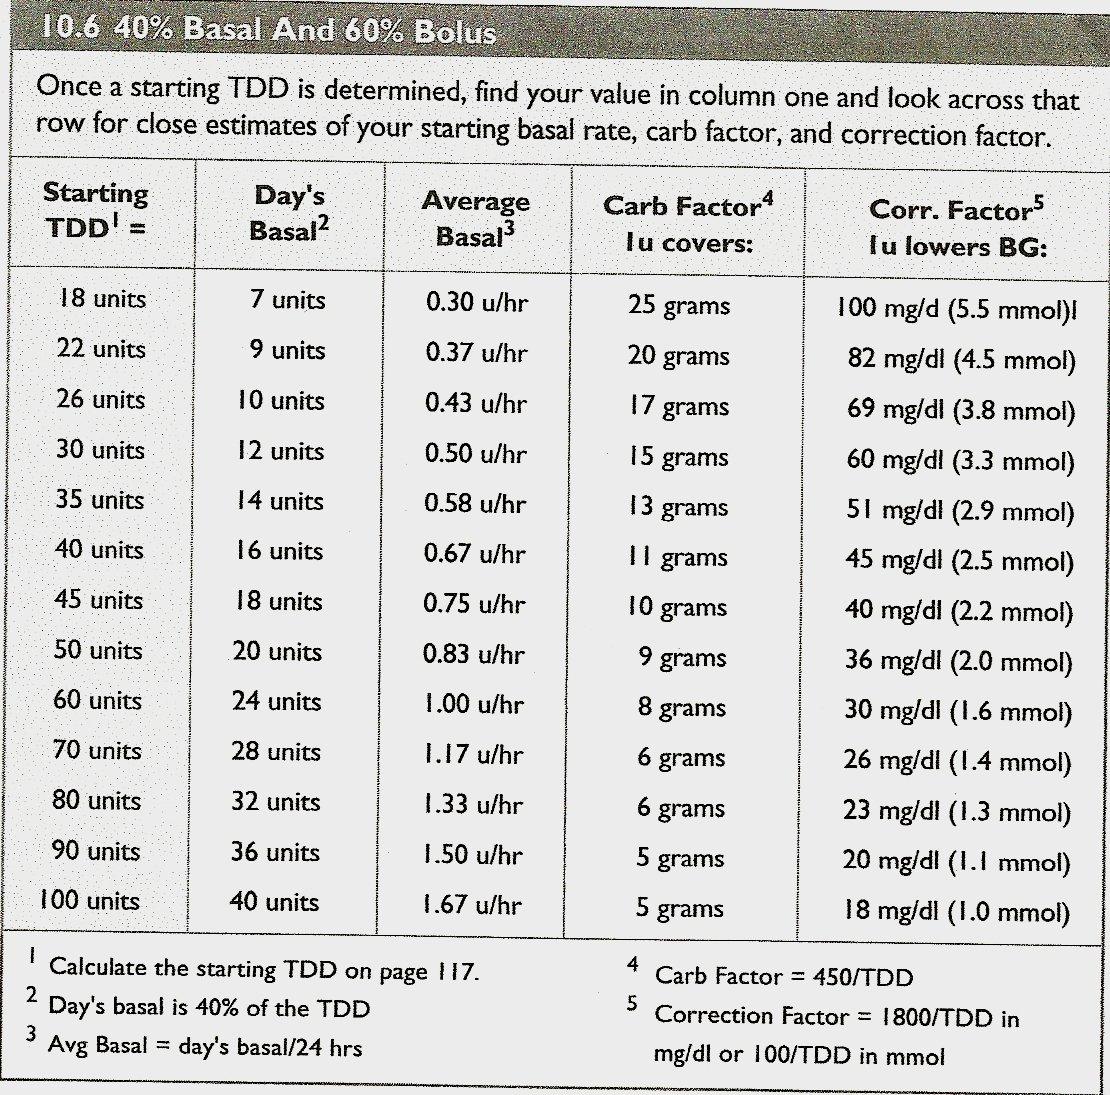 28 Day Expiration Chart Insulin – Samyysandra 28 Days Medication Expiration Calender For March